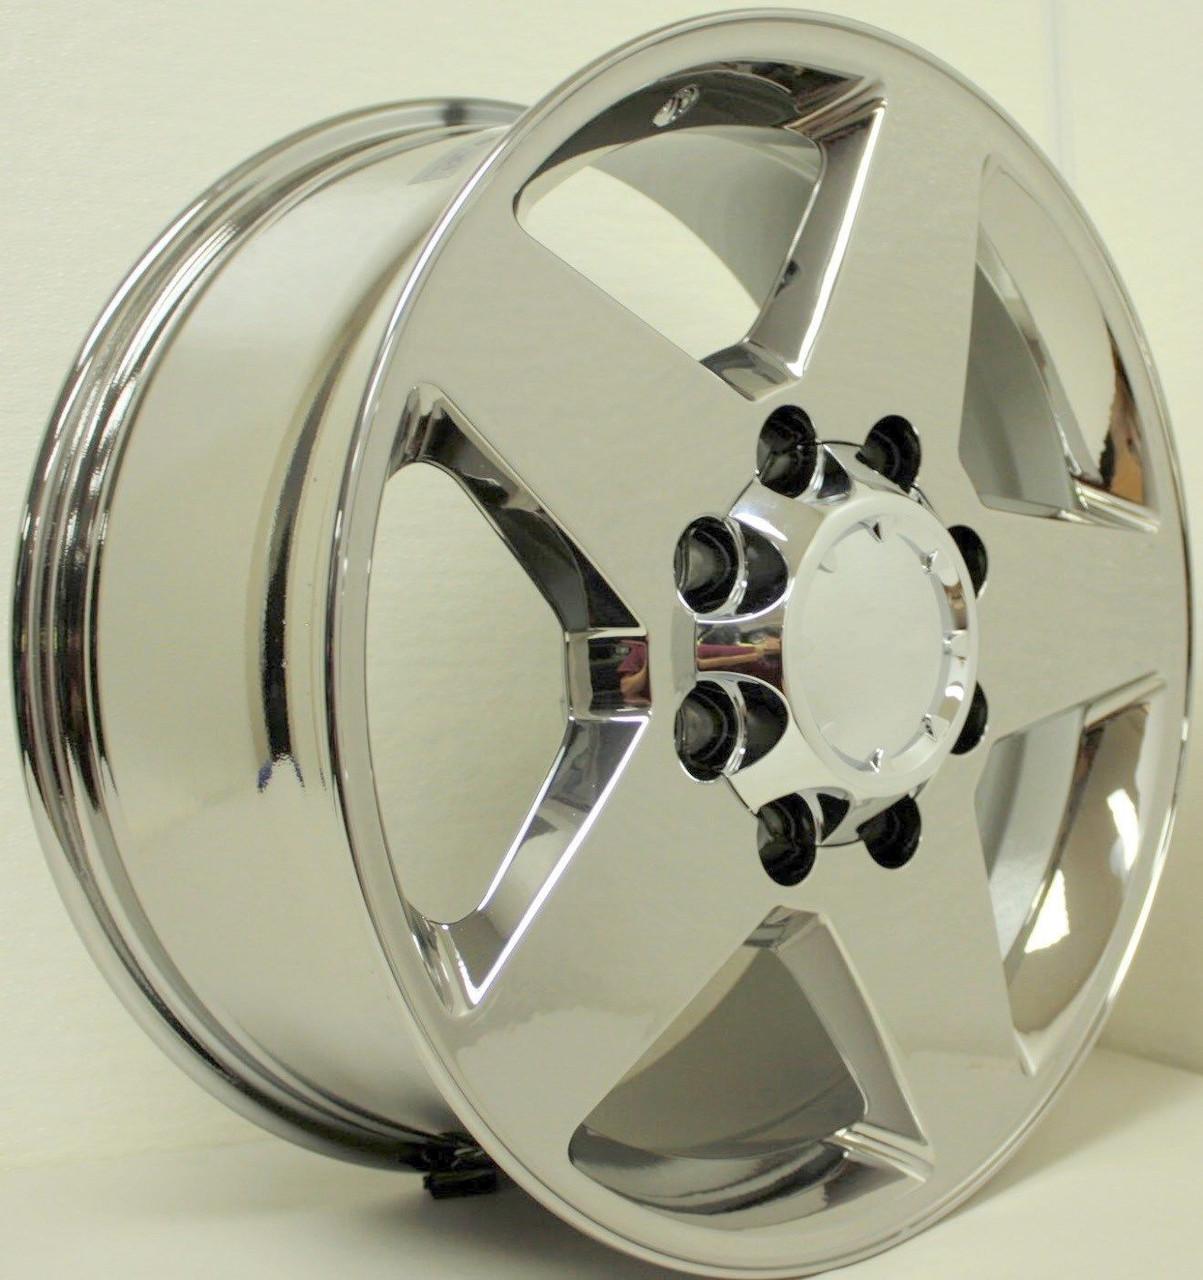 "Chrome 20"" 8 Lug 8x180 5 Spoke Wheels for 2011-2018 Chevy 2500 3500 - New Set of 4"